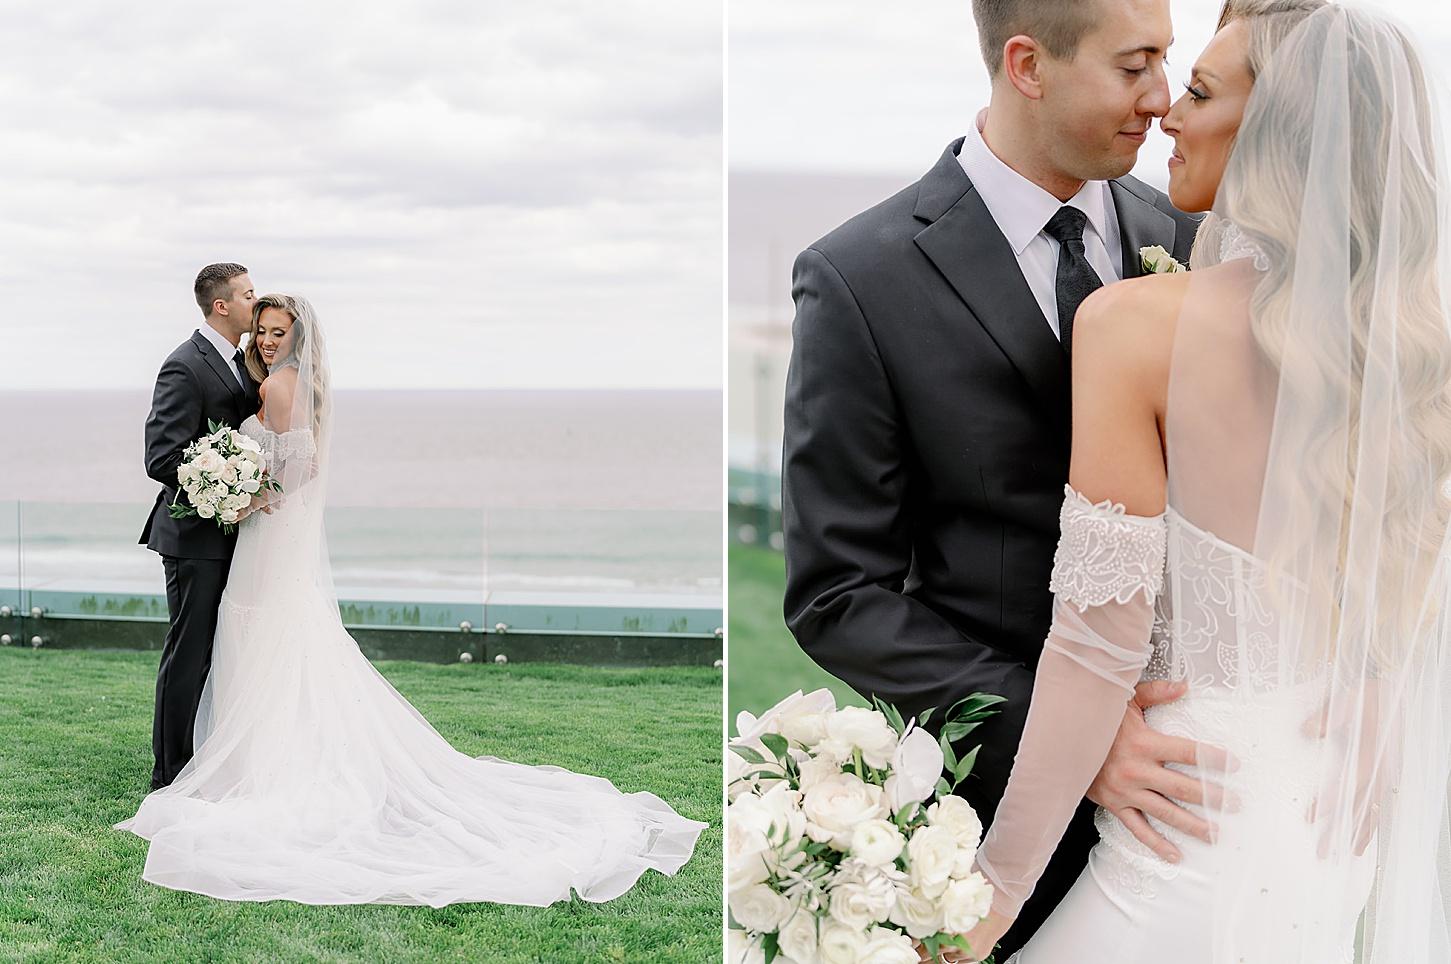 Atlantic City Wedding Photography Studio by Magdalena Studios Lexy Cha 0043